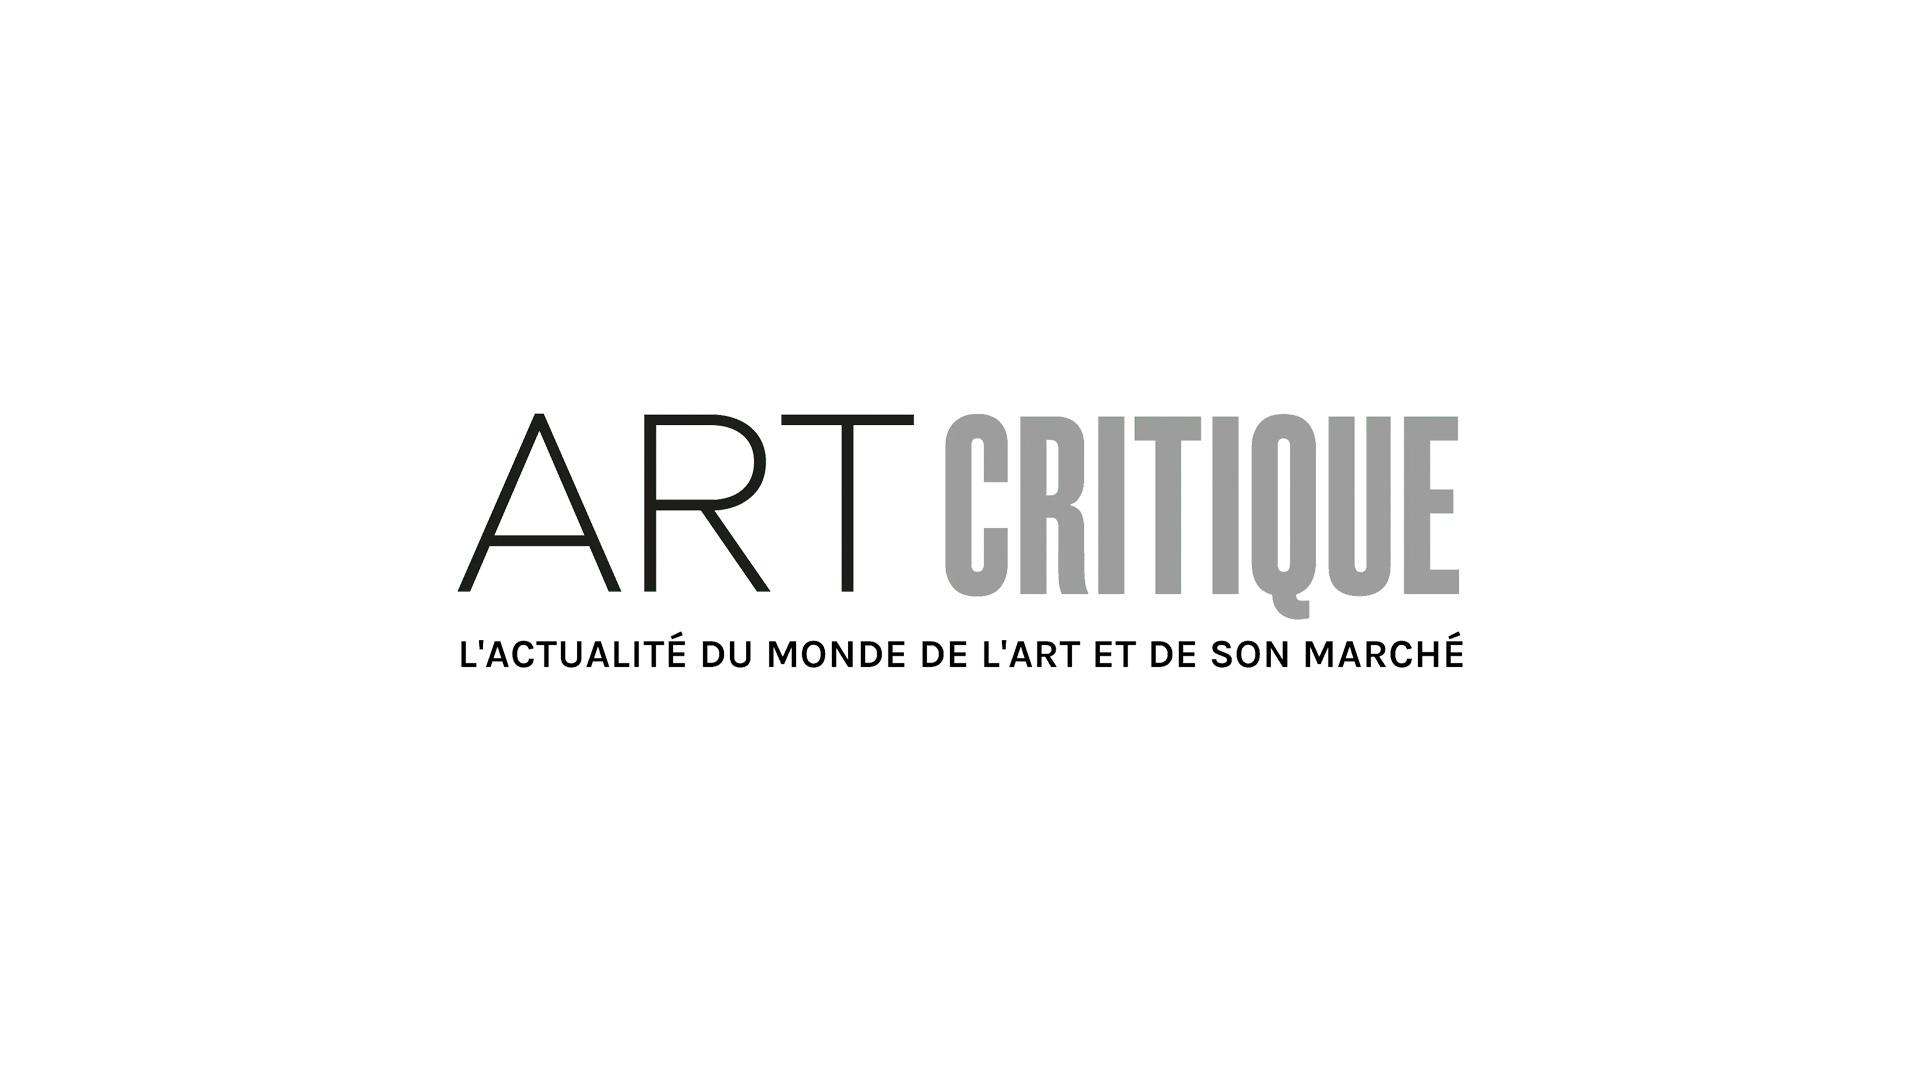 Dr Joan Weinstein chosen as director of the J. Paul Getty Foundation